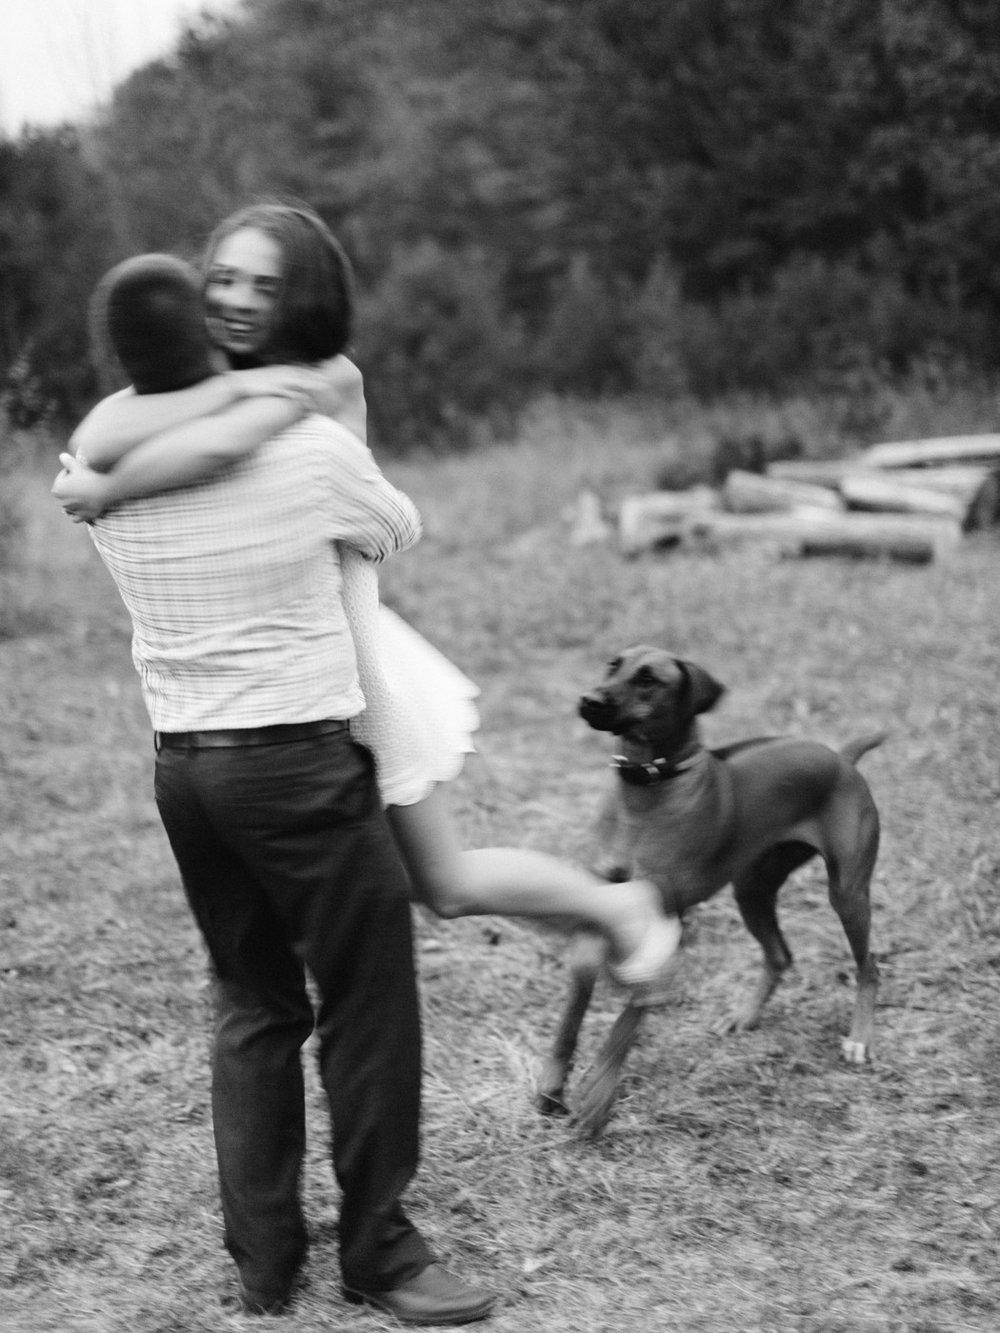 toronto_wedding_photographer_engagement_dog_inspiration-52.jpg